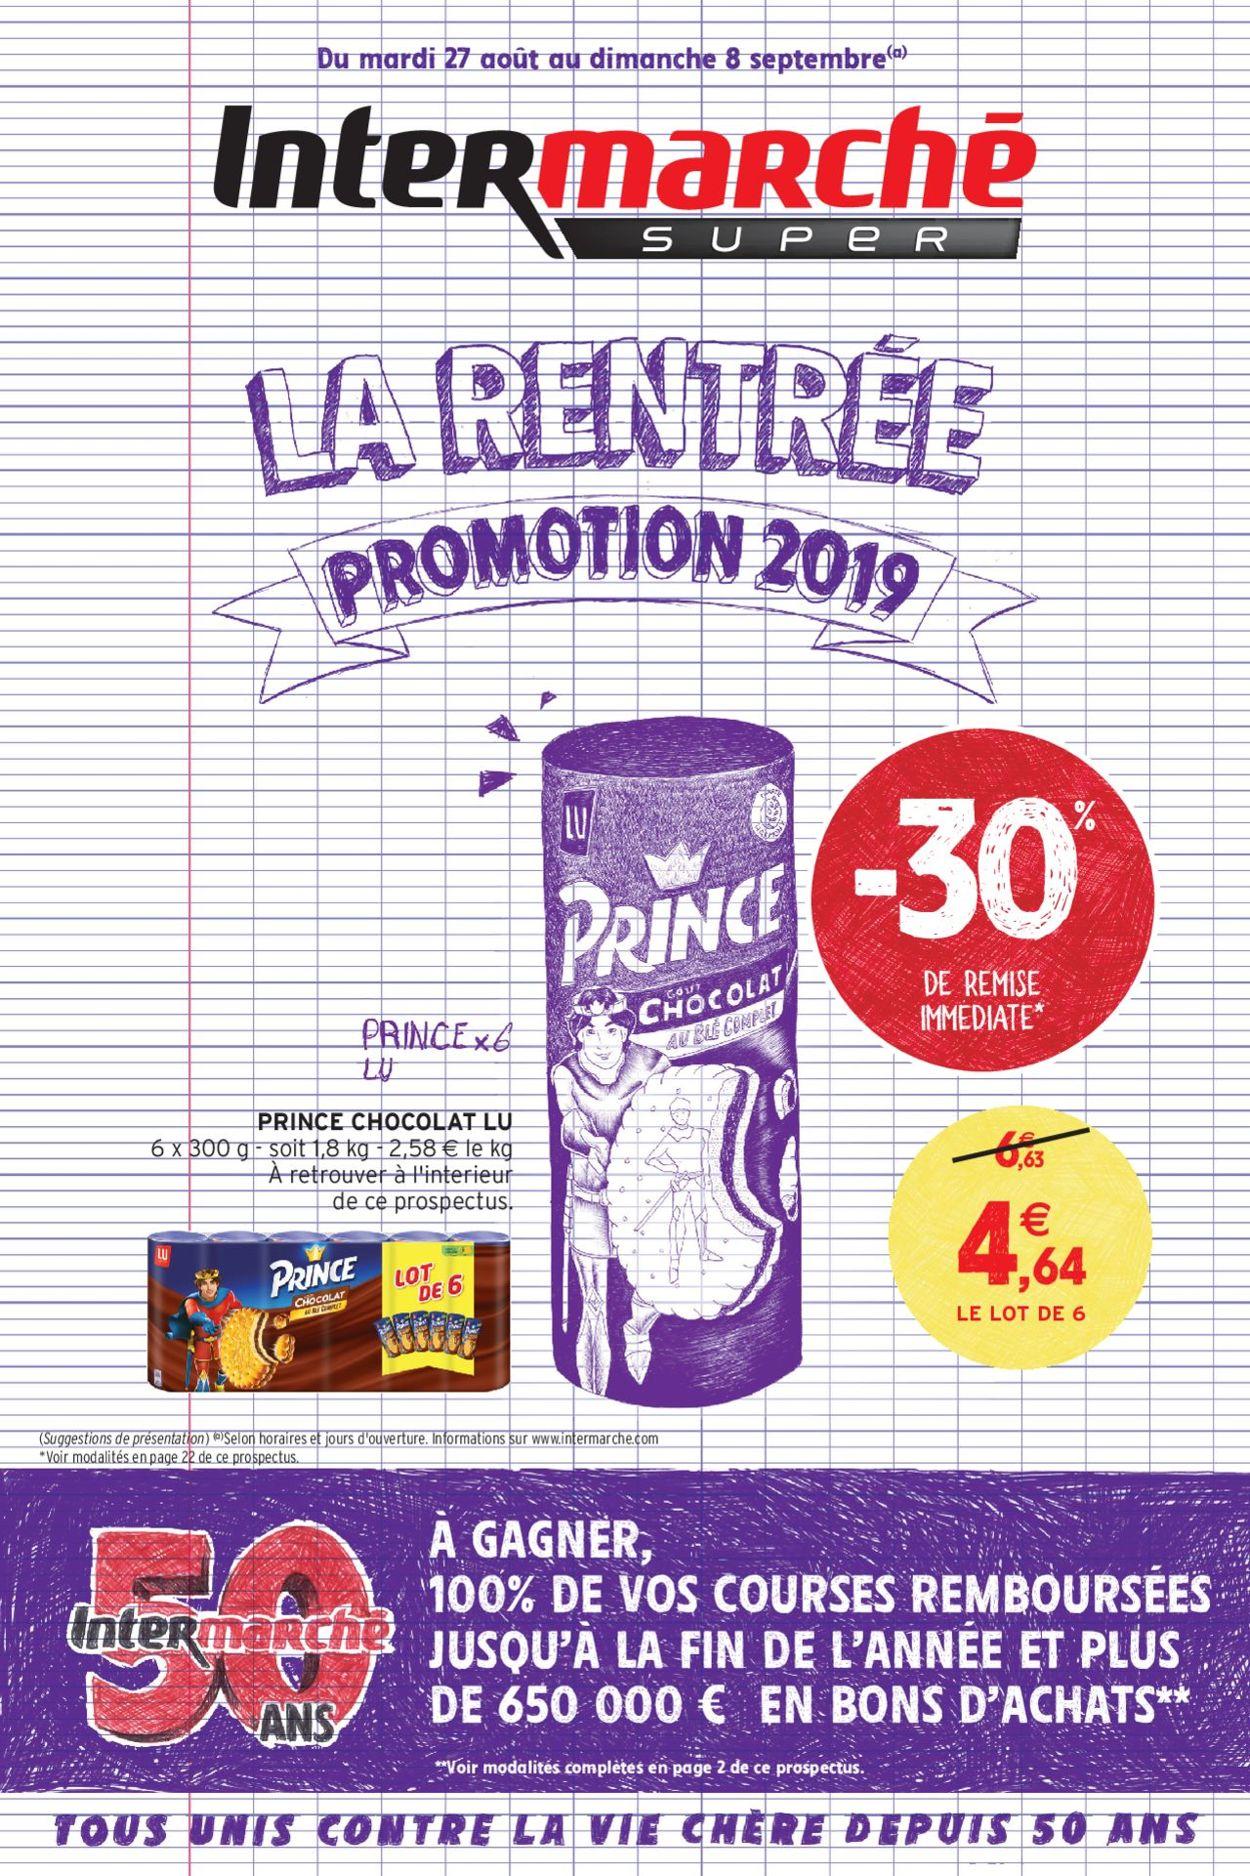 Intermarché Catalogue - 27.08-08.09.2019